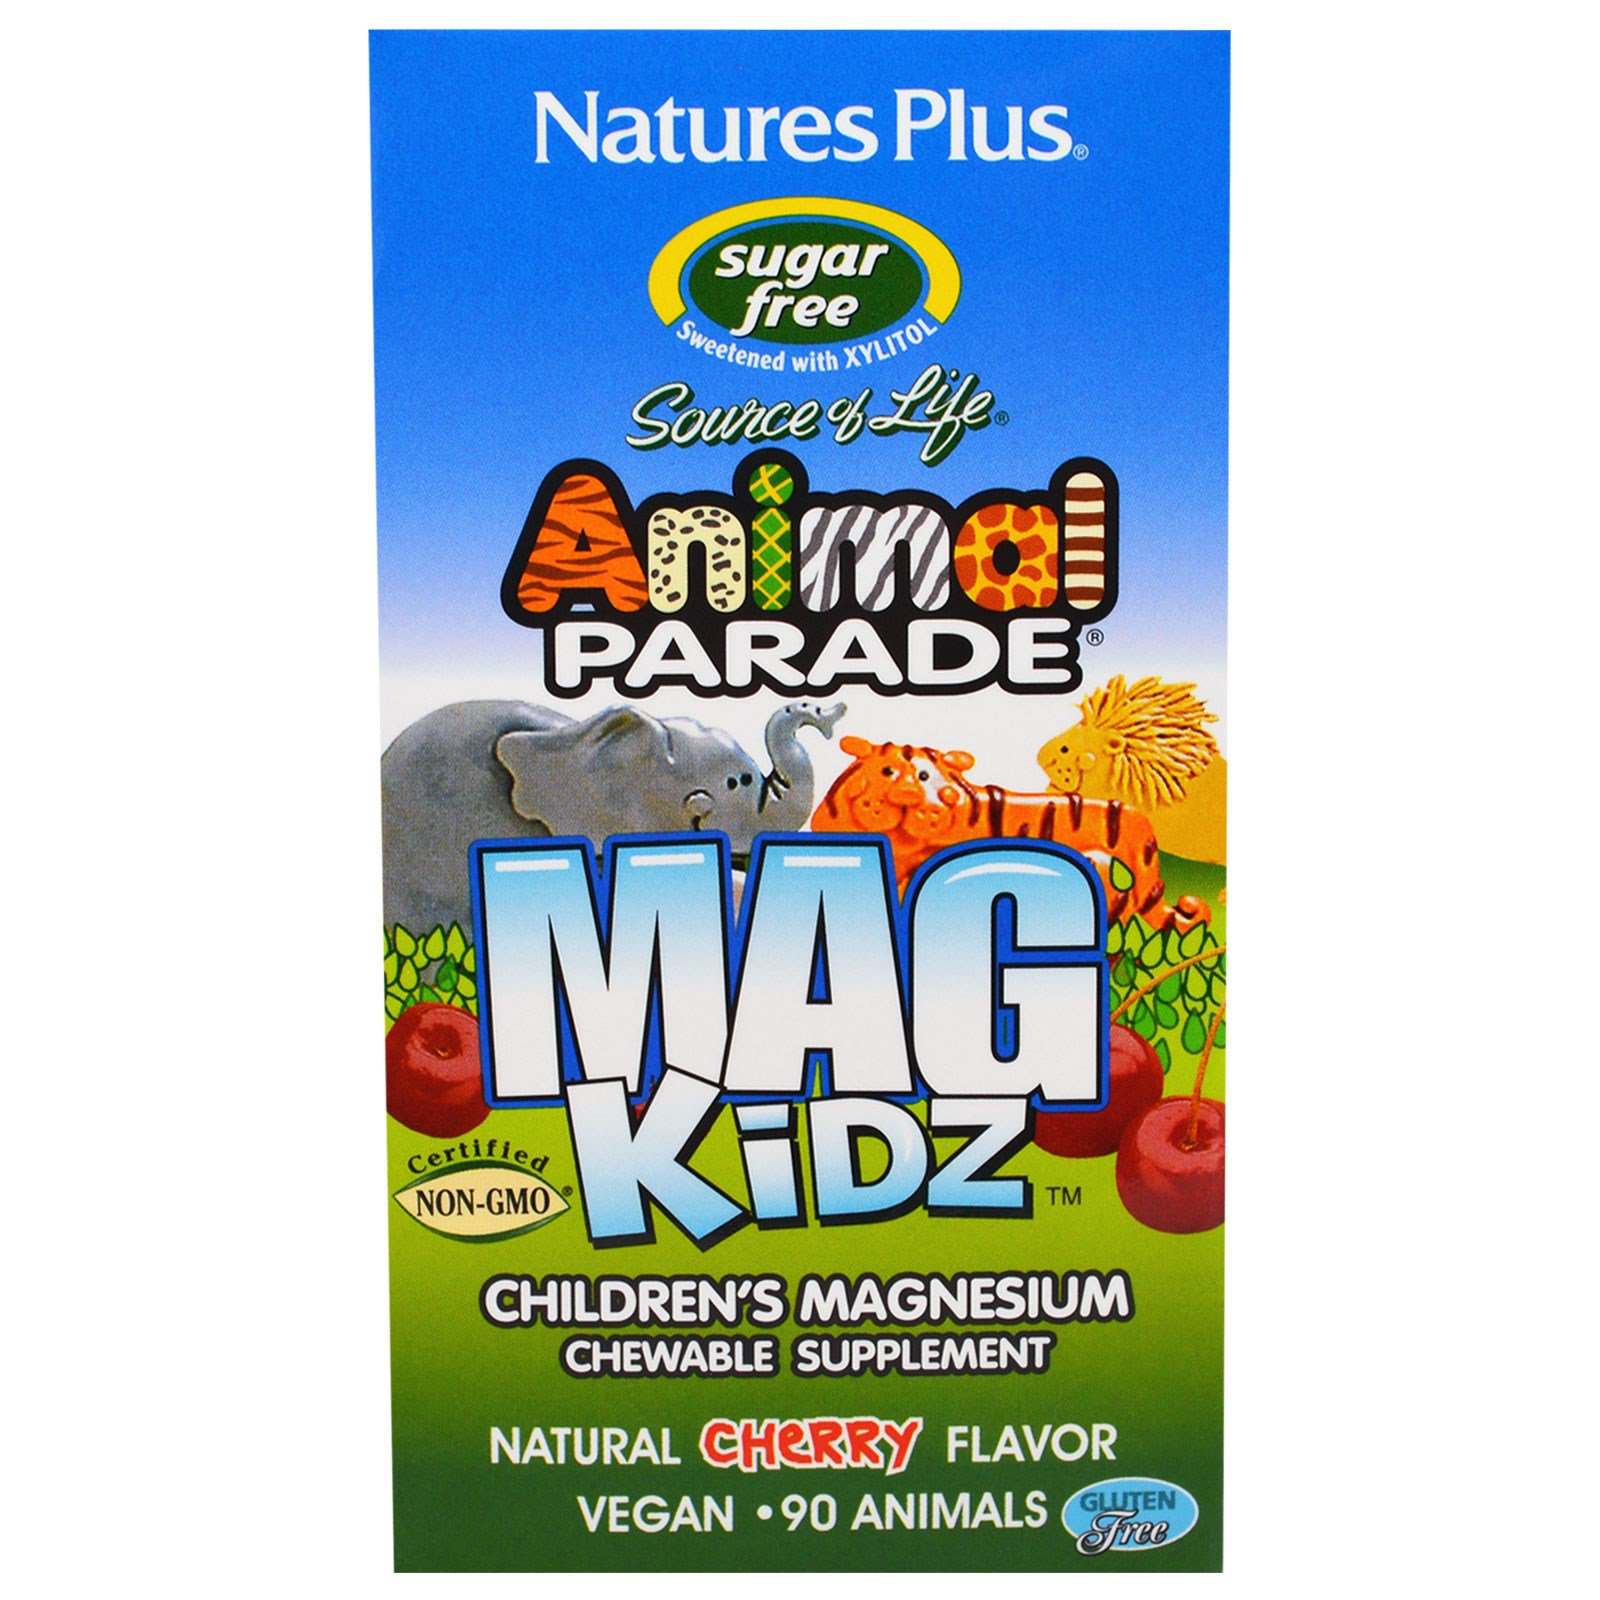 Image of MagKidz, Children's Magnesium, Natural Cherry Flavor (90 Animals) - Nature's Plus 0097467299429